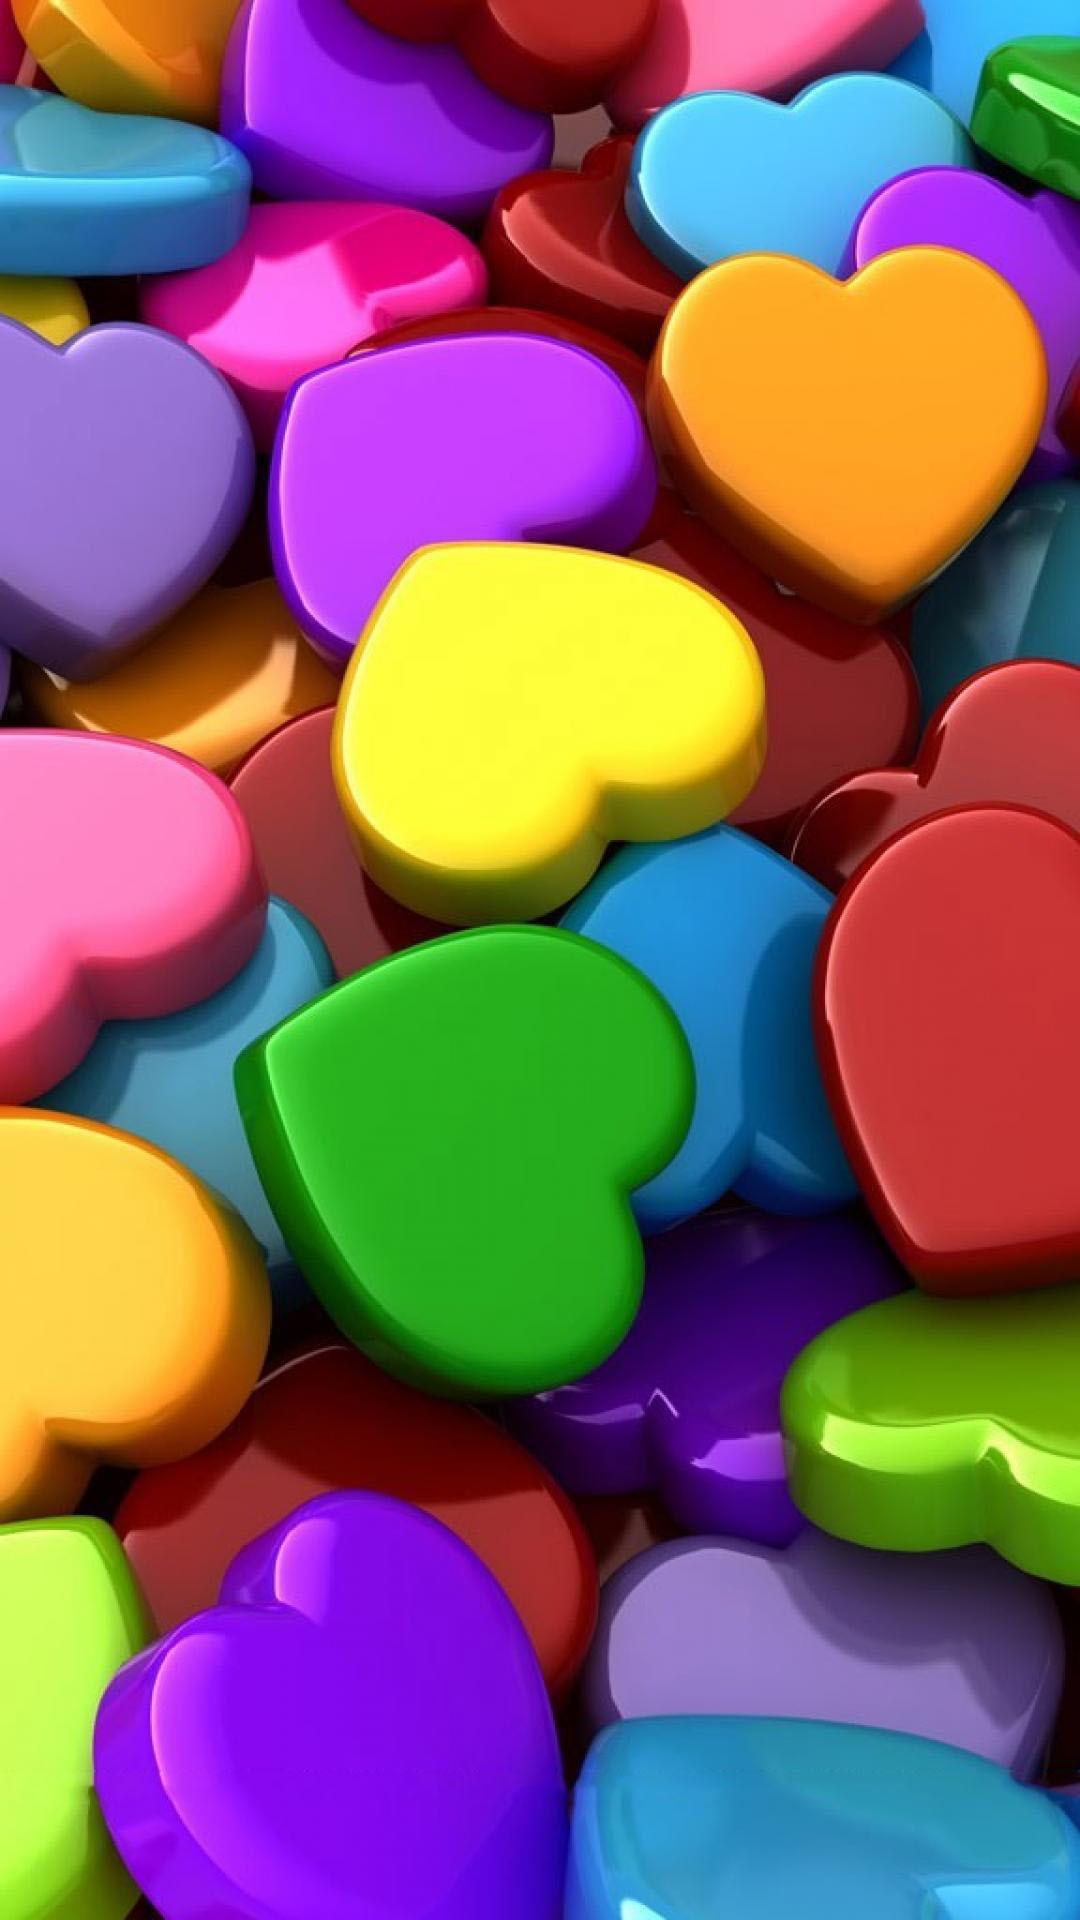 Fantastic Wallpaper Love Iphone 4s - 832498-image-wallpaper-love-1080x1920-for-ios  Trends_598365.jpg